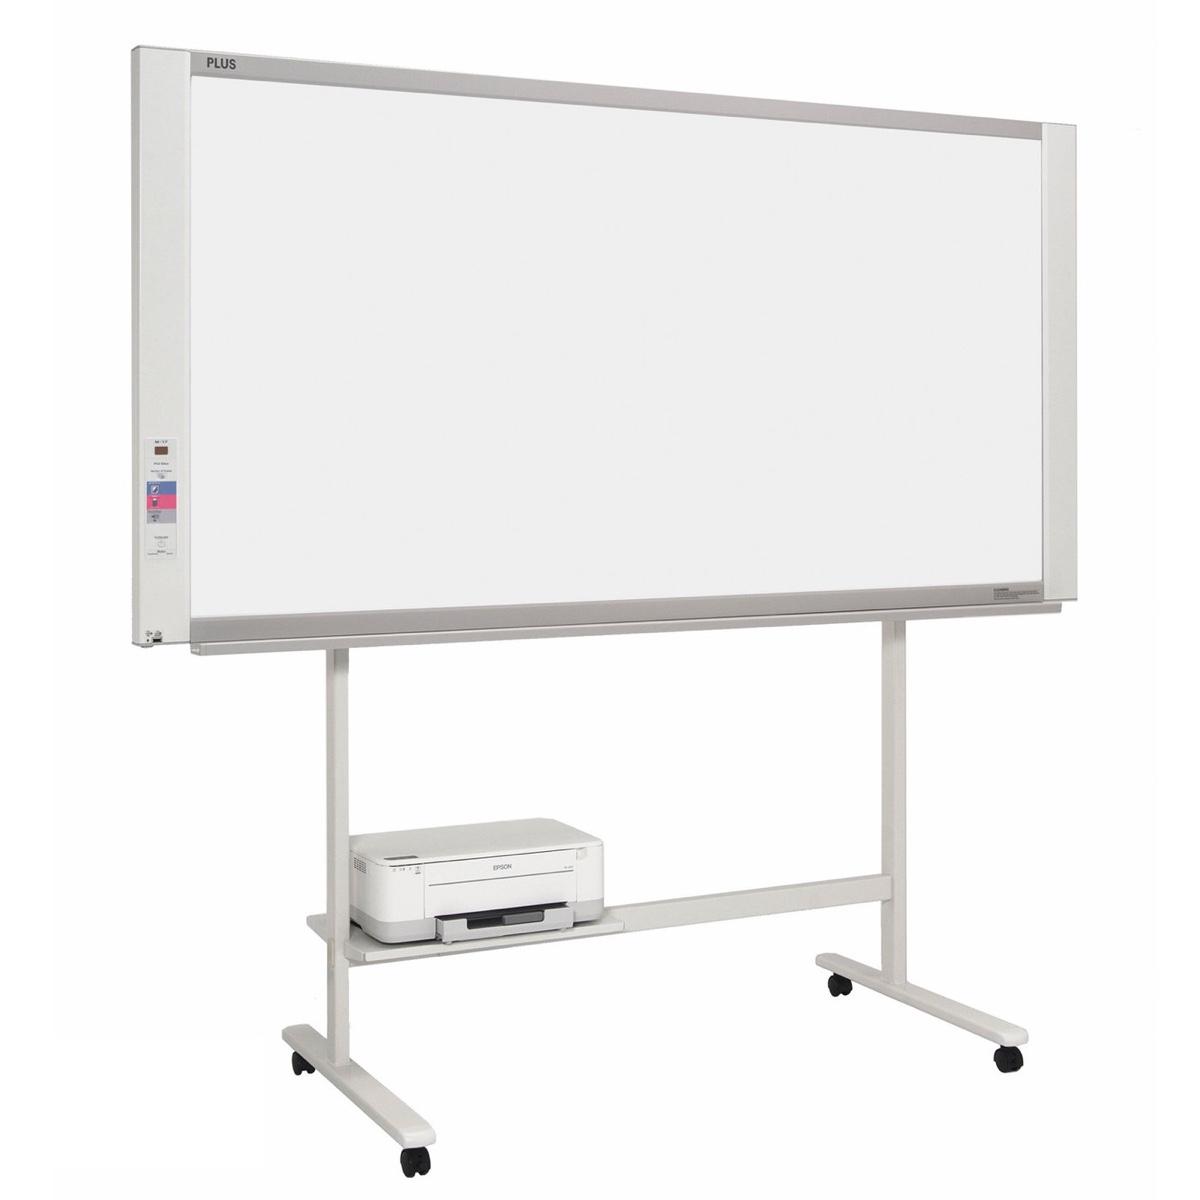 PLUS Whiteboards:  The PLUS Copyboard M-17W